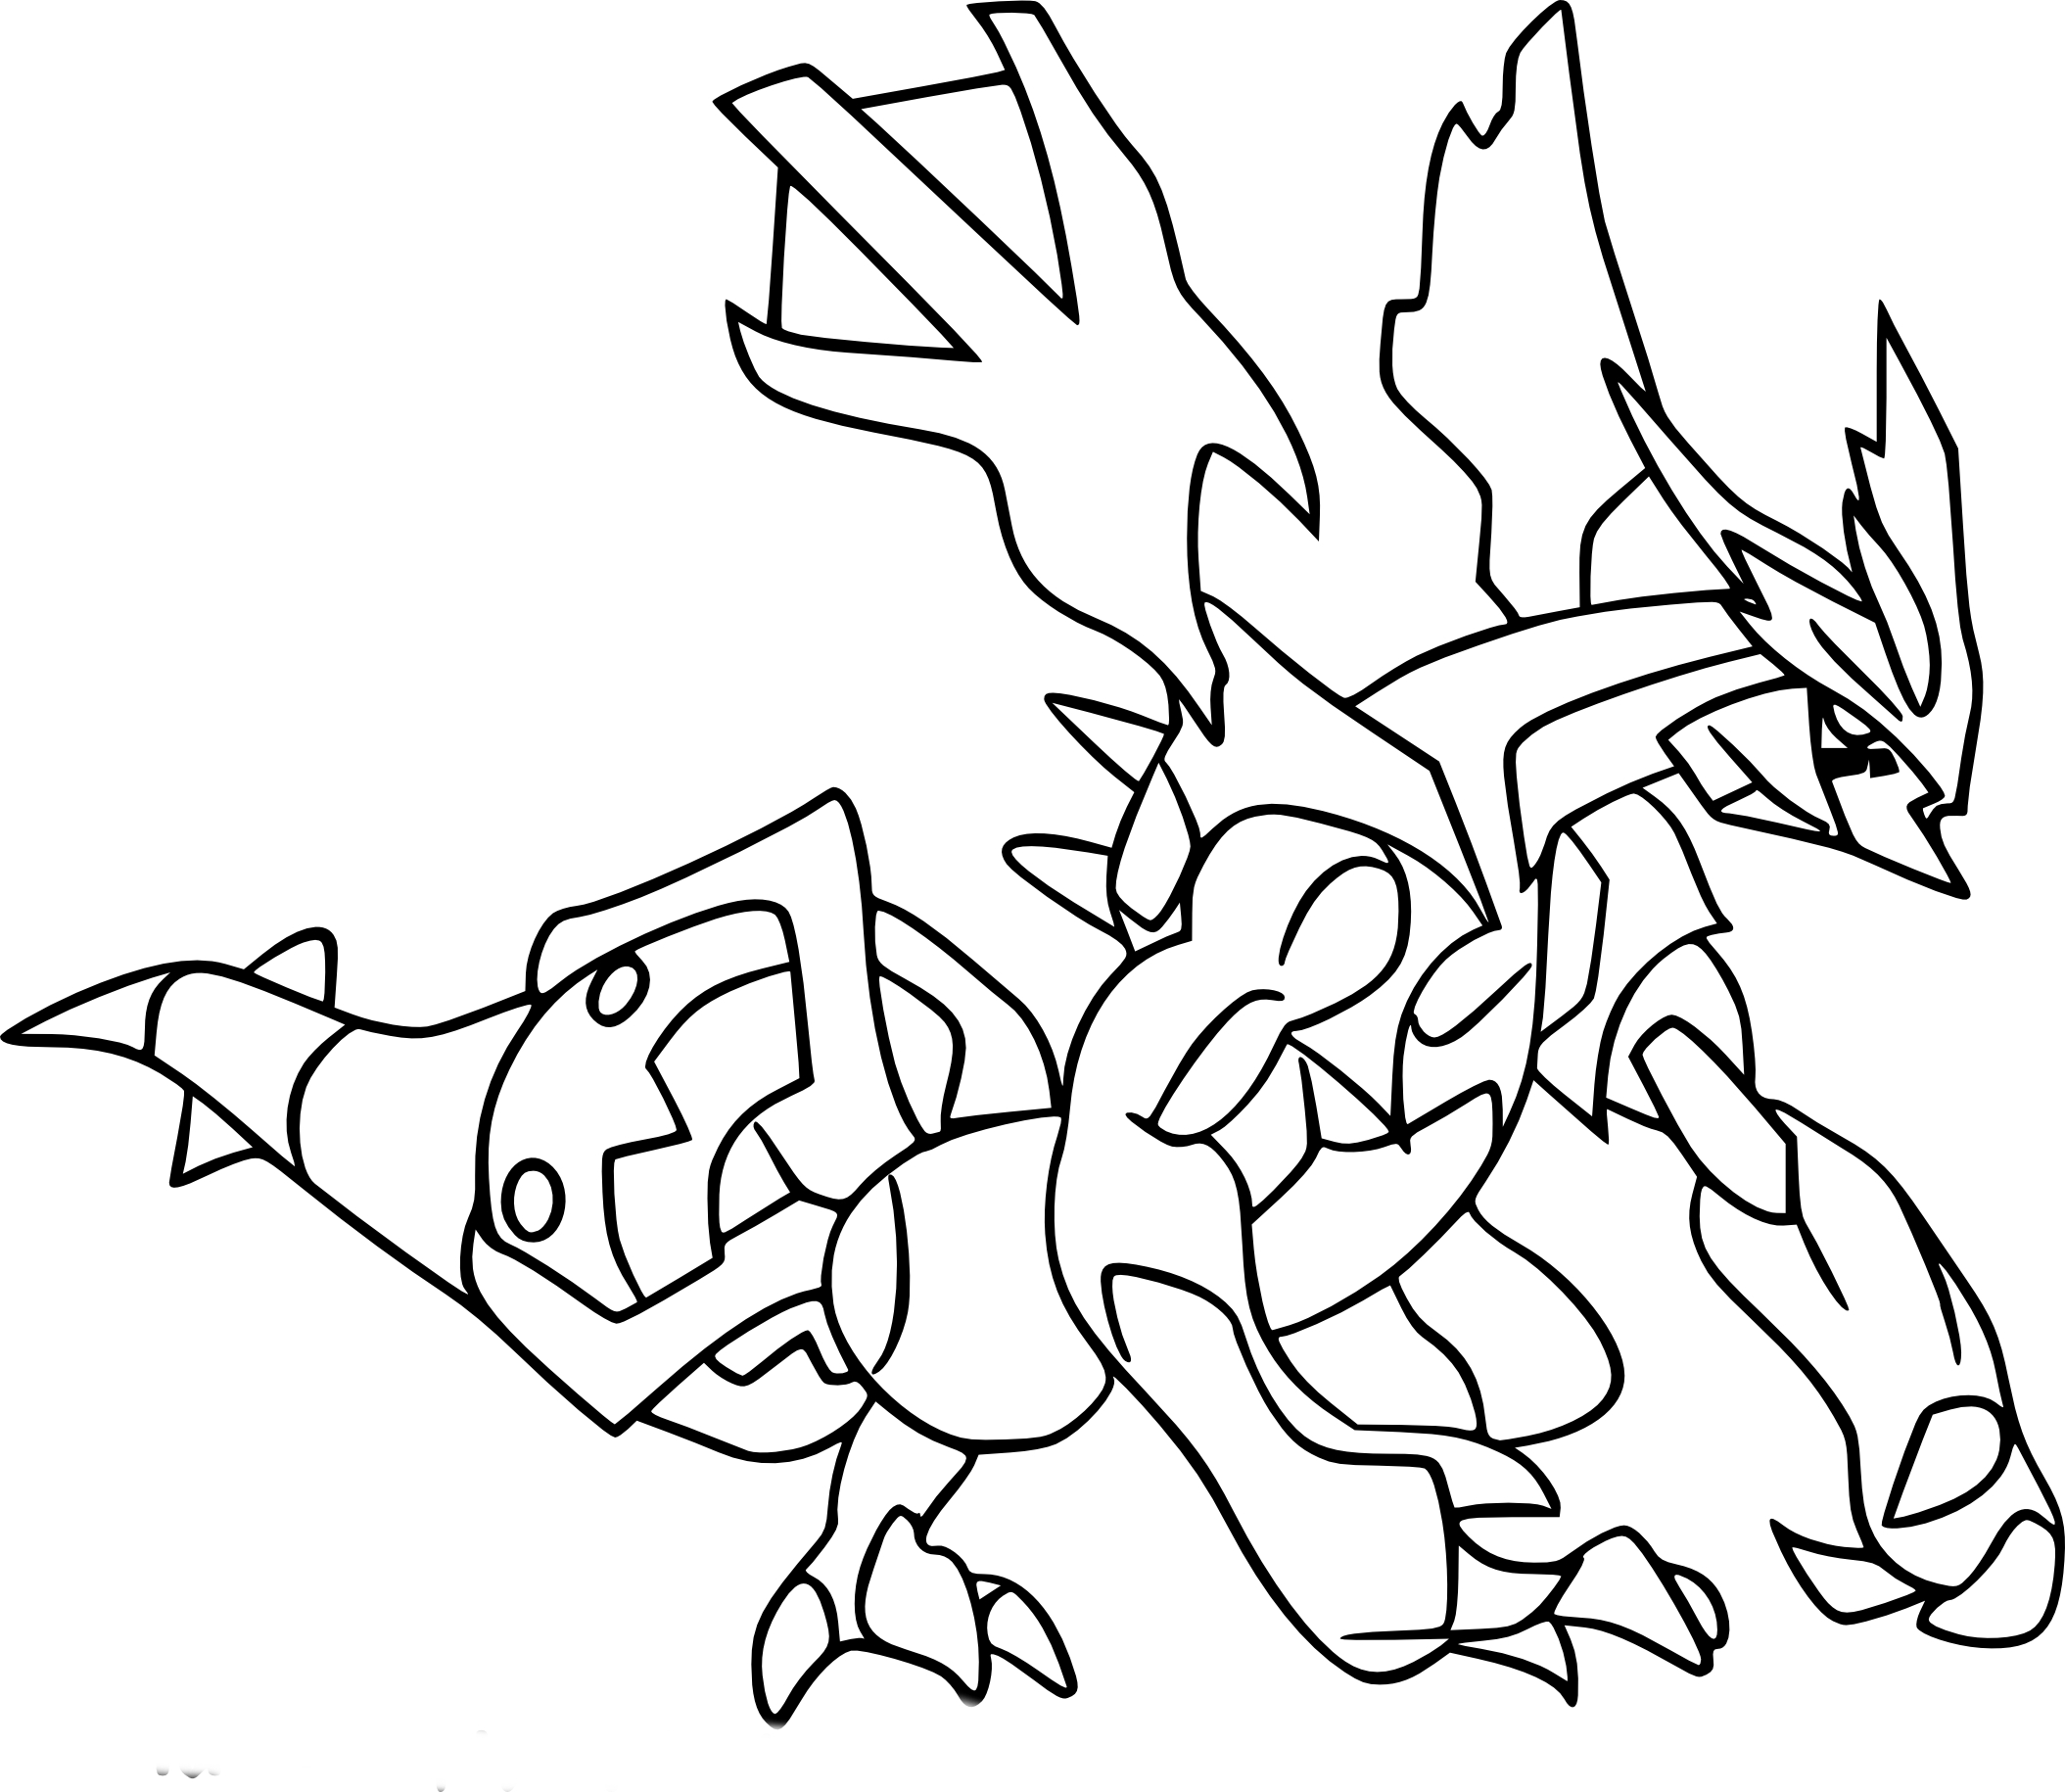 Frais dragon feu coloriage ex - Coloriage pokemon feu ...